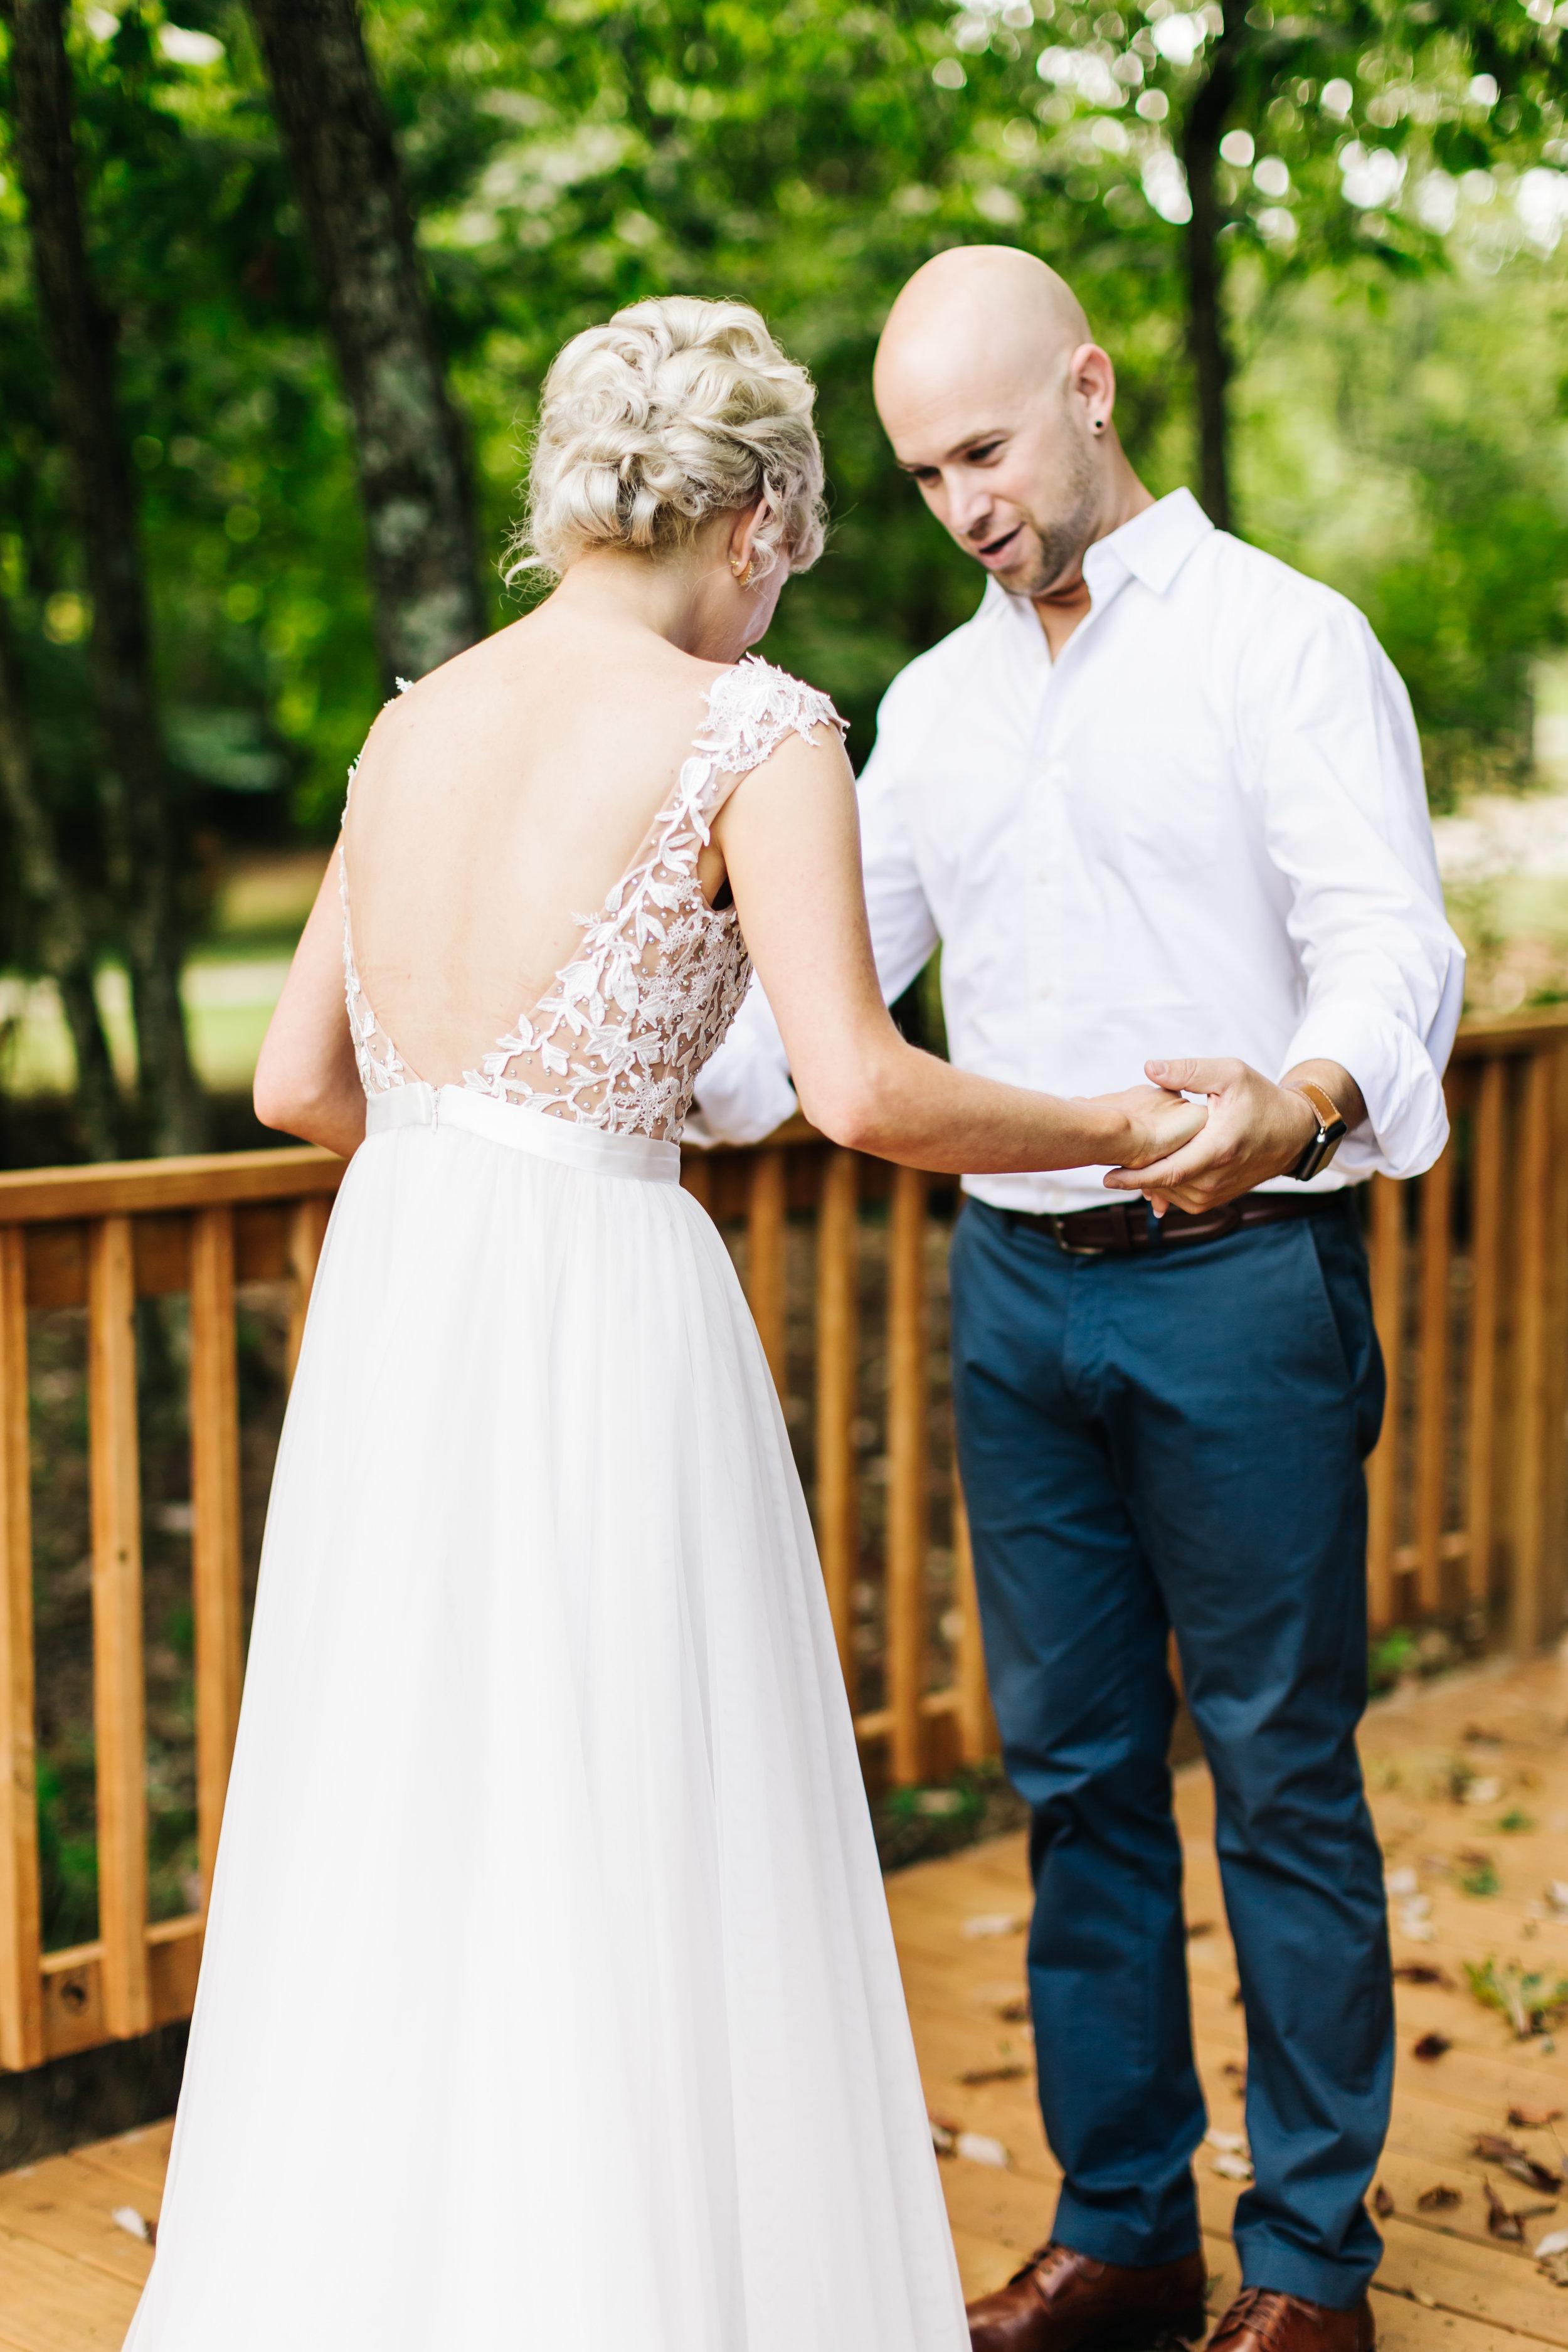 2018.09.02 Ray and Sarah Prizner Nashville TN Wedding FINALS-68.jpg